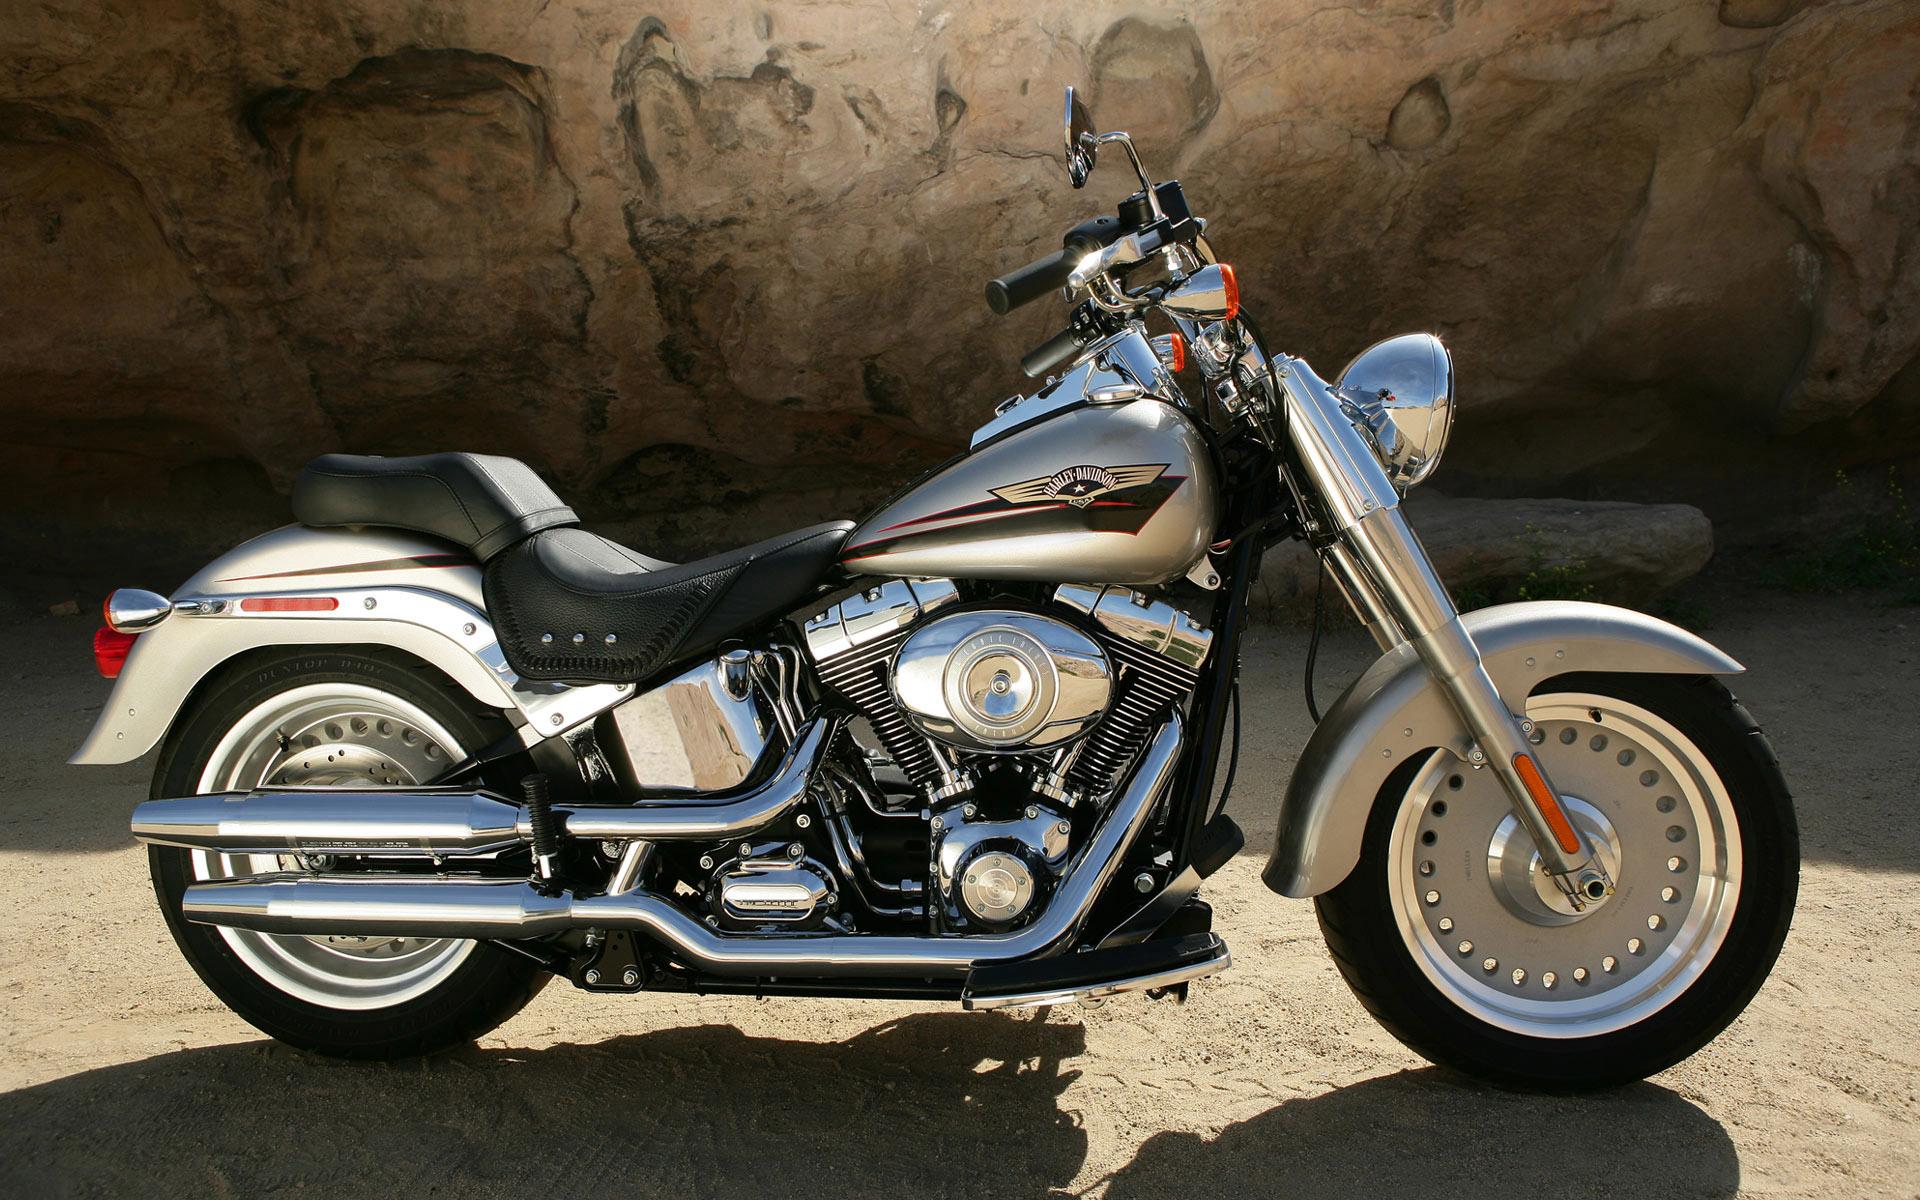 Kids n funcom Wallpaper Harley Davidson widescreen 1920x1200